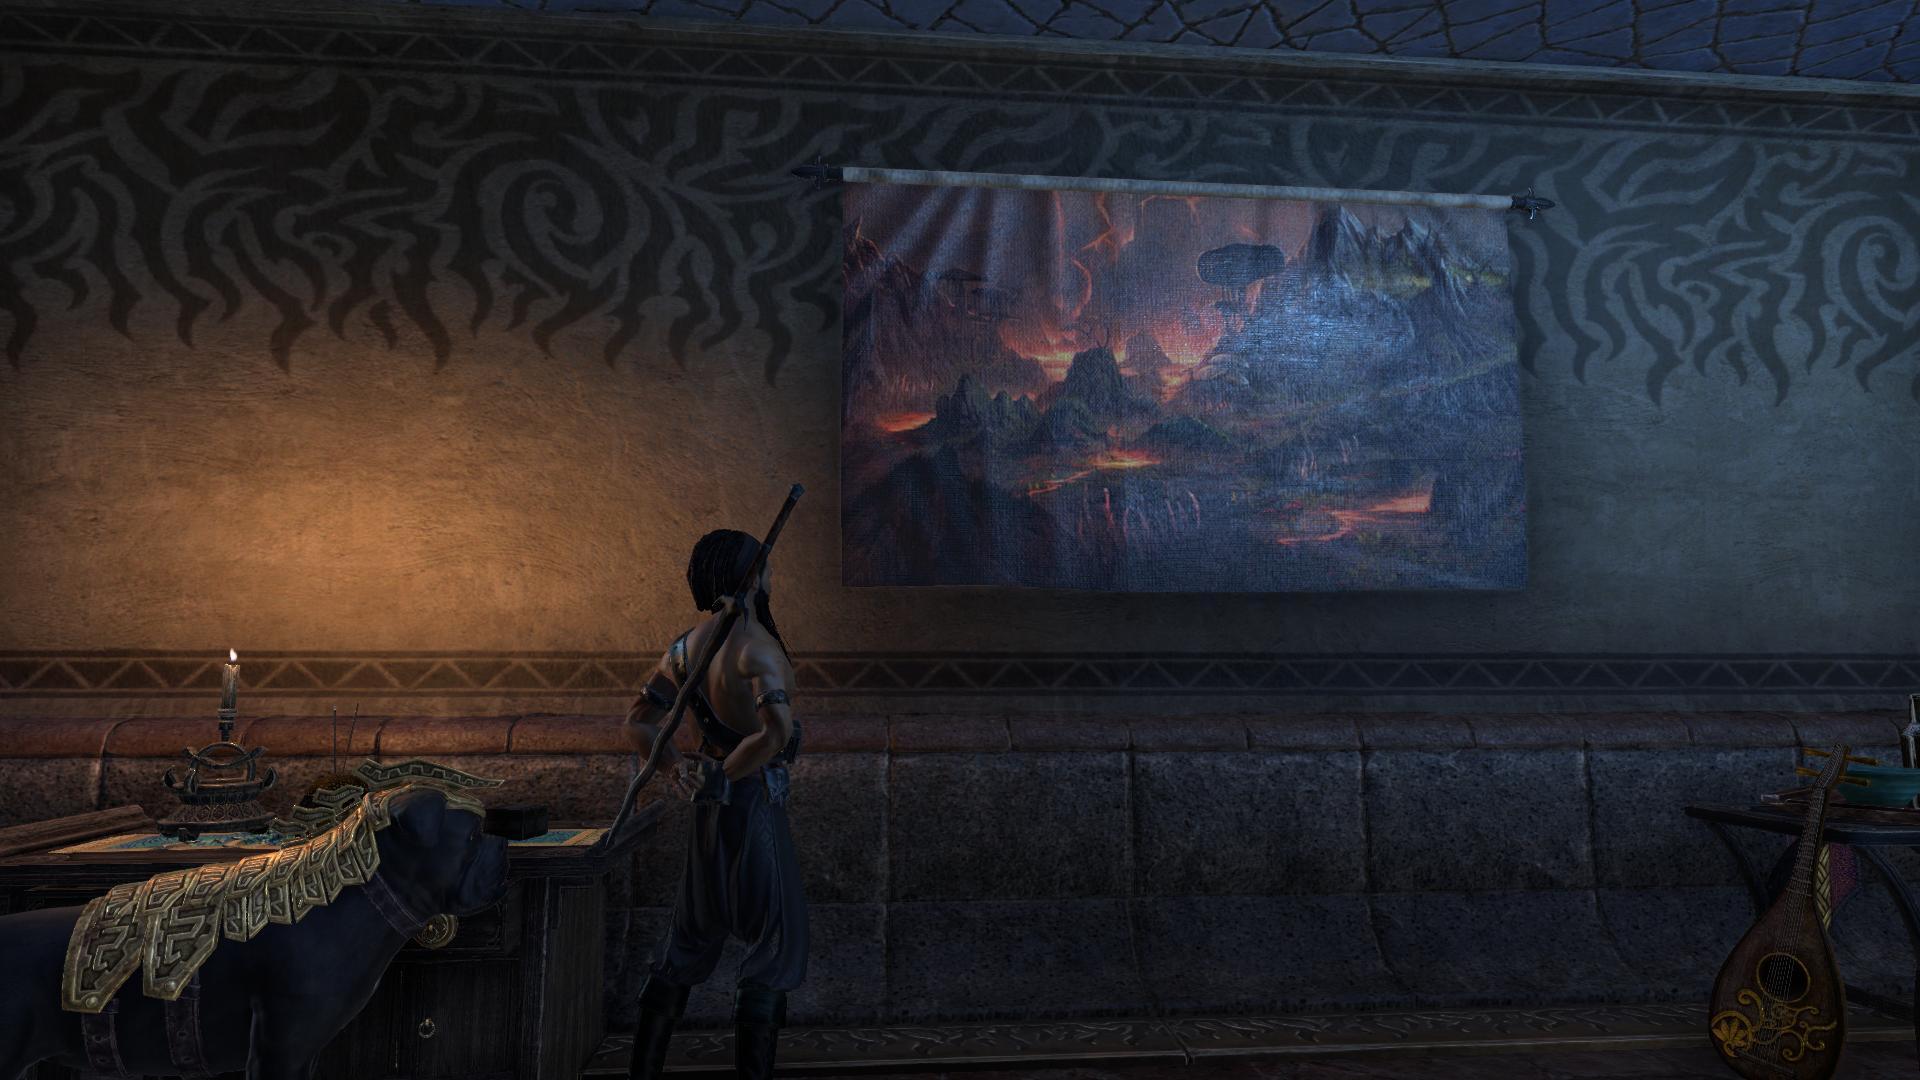 Elder Scrolls Online: Morrowind will not blow your mind, but